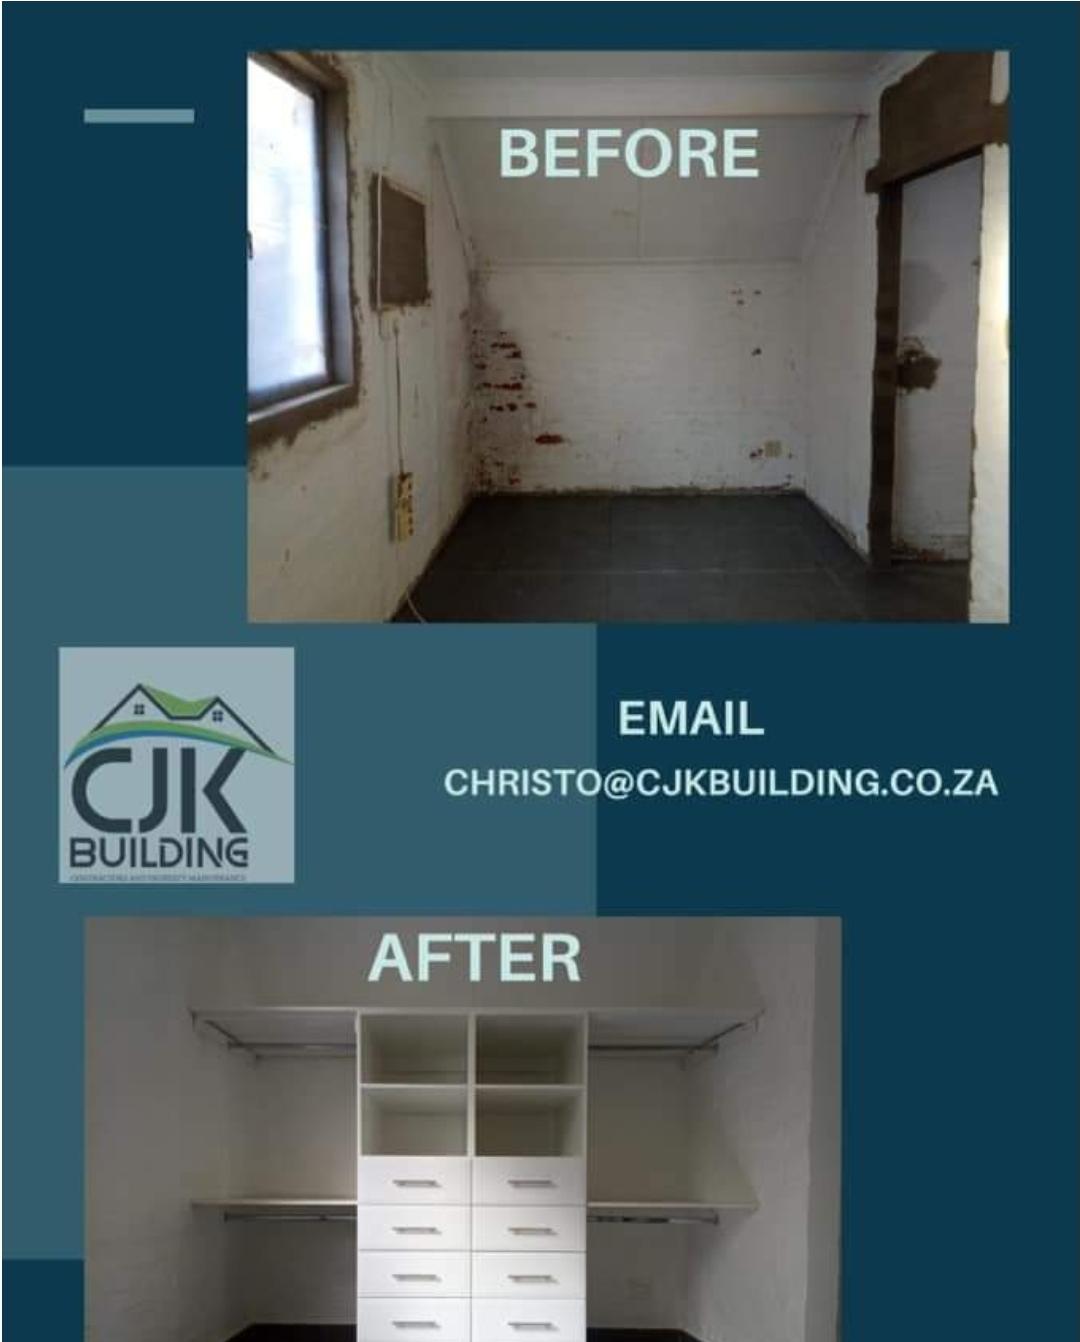 CJK building